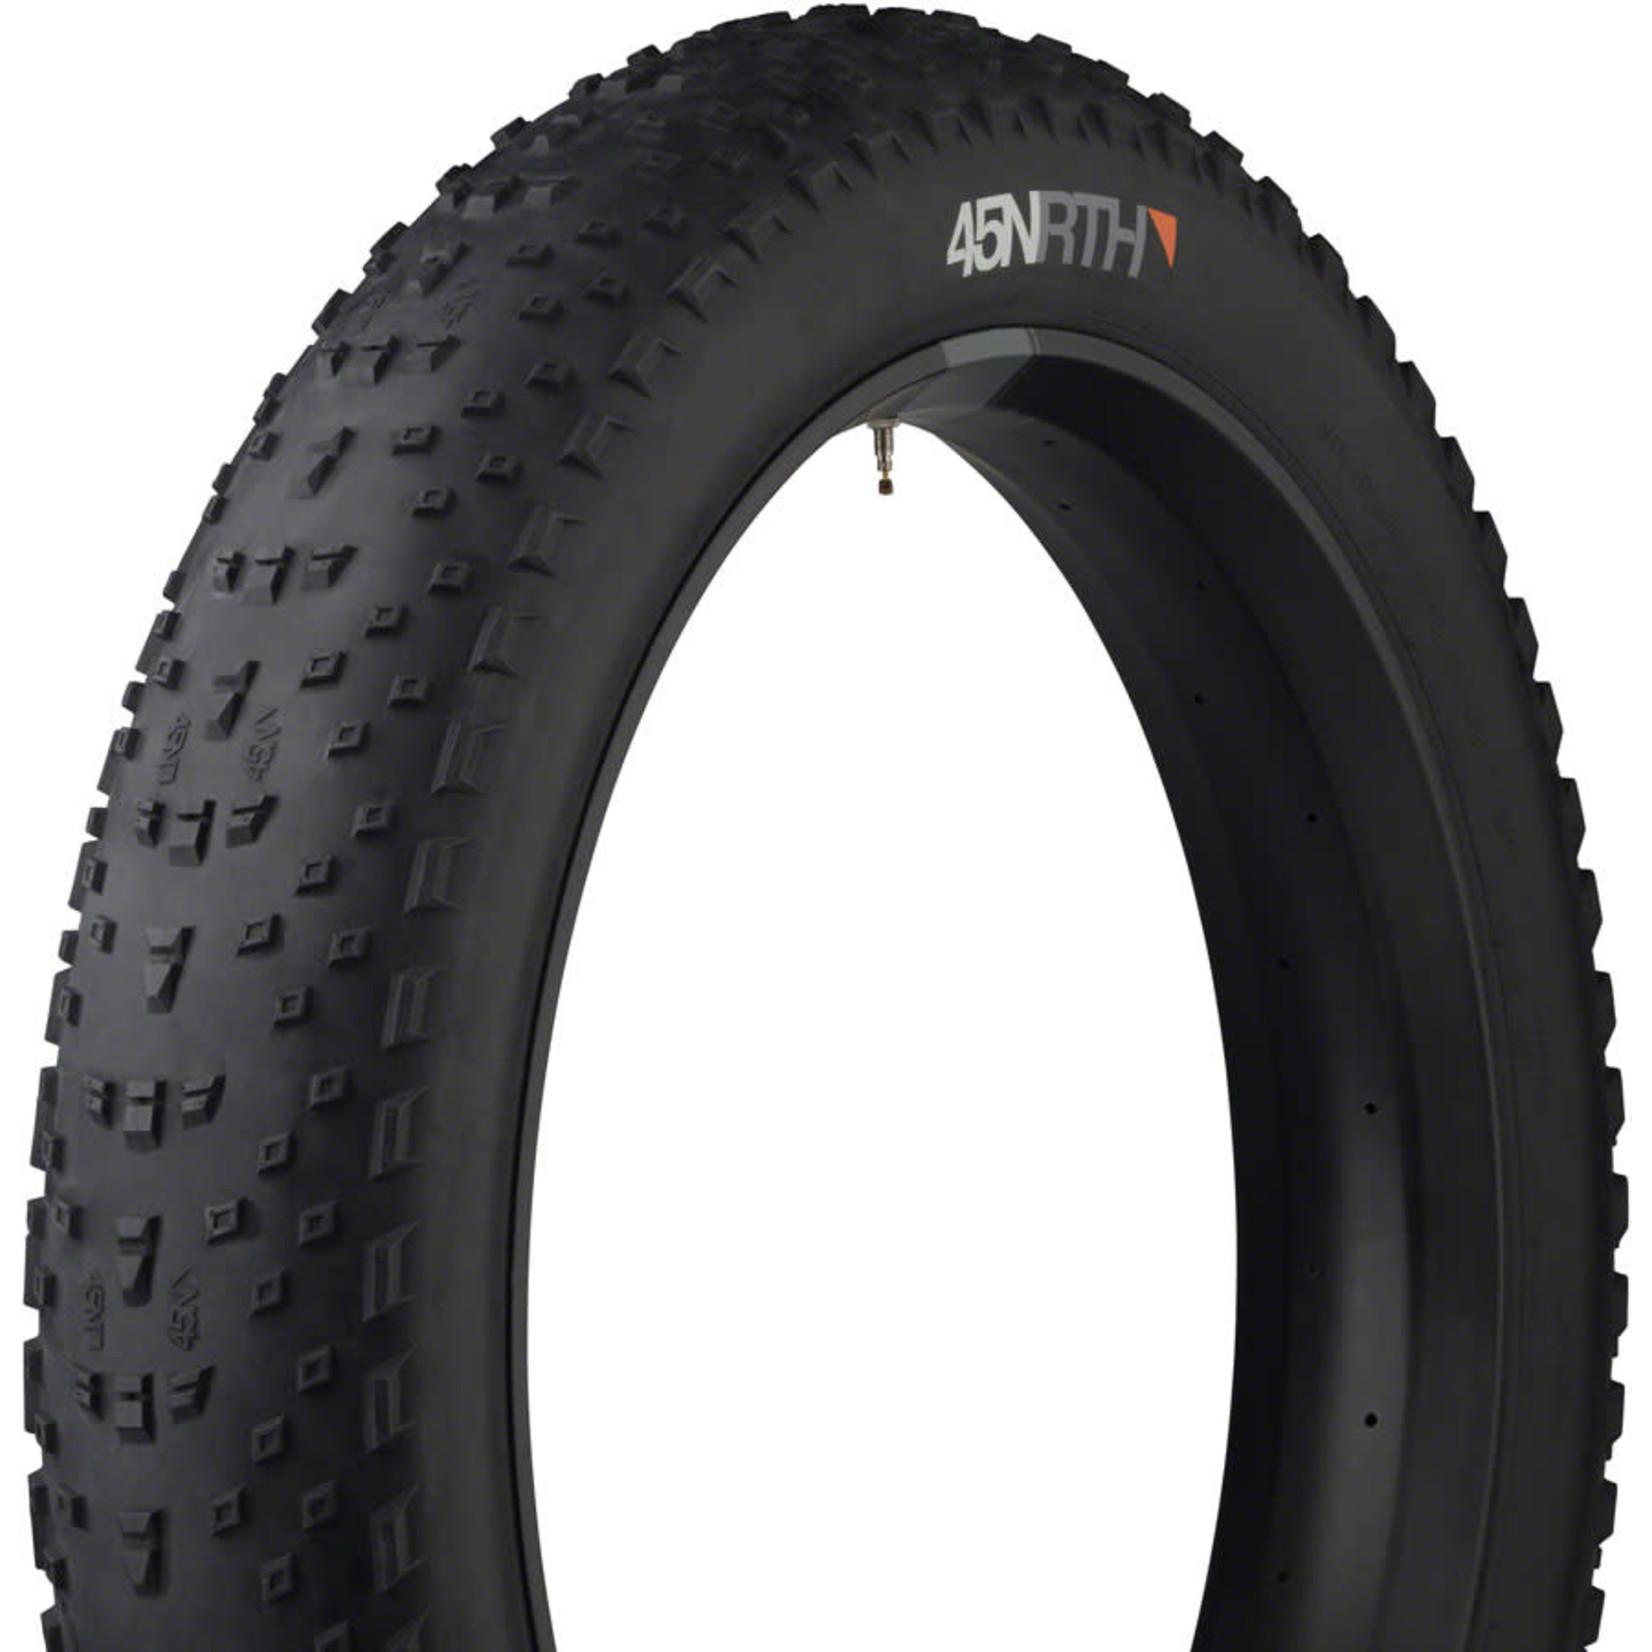 "45NRTH 45NRTH Husker Du Fatbike Tire: 26 x 4.8"" 60tpi Tubeless Ready Folding"